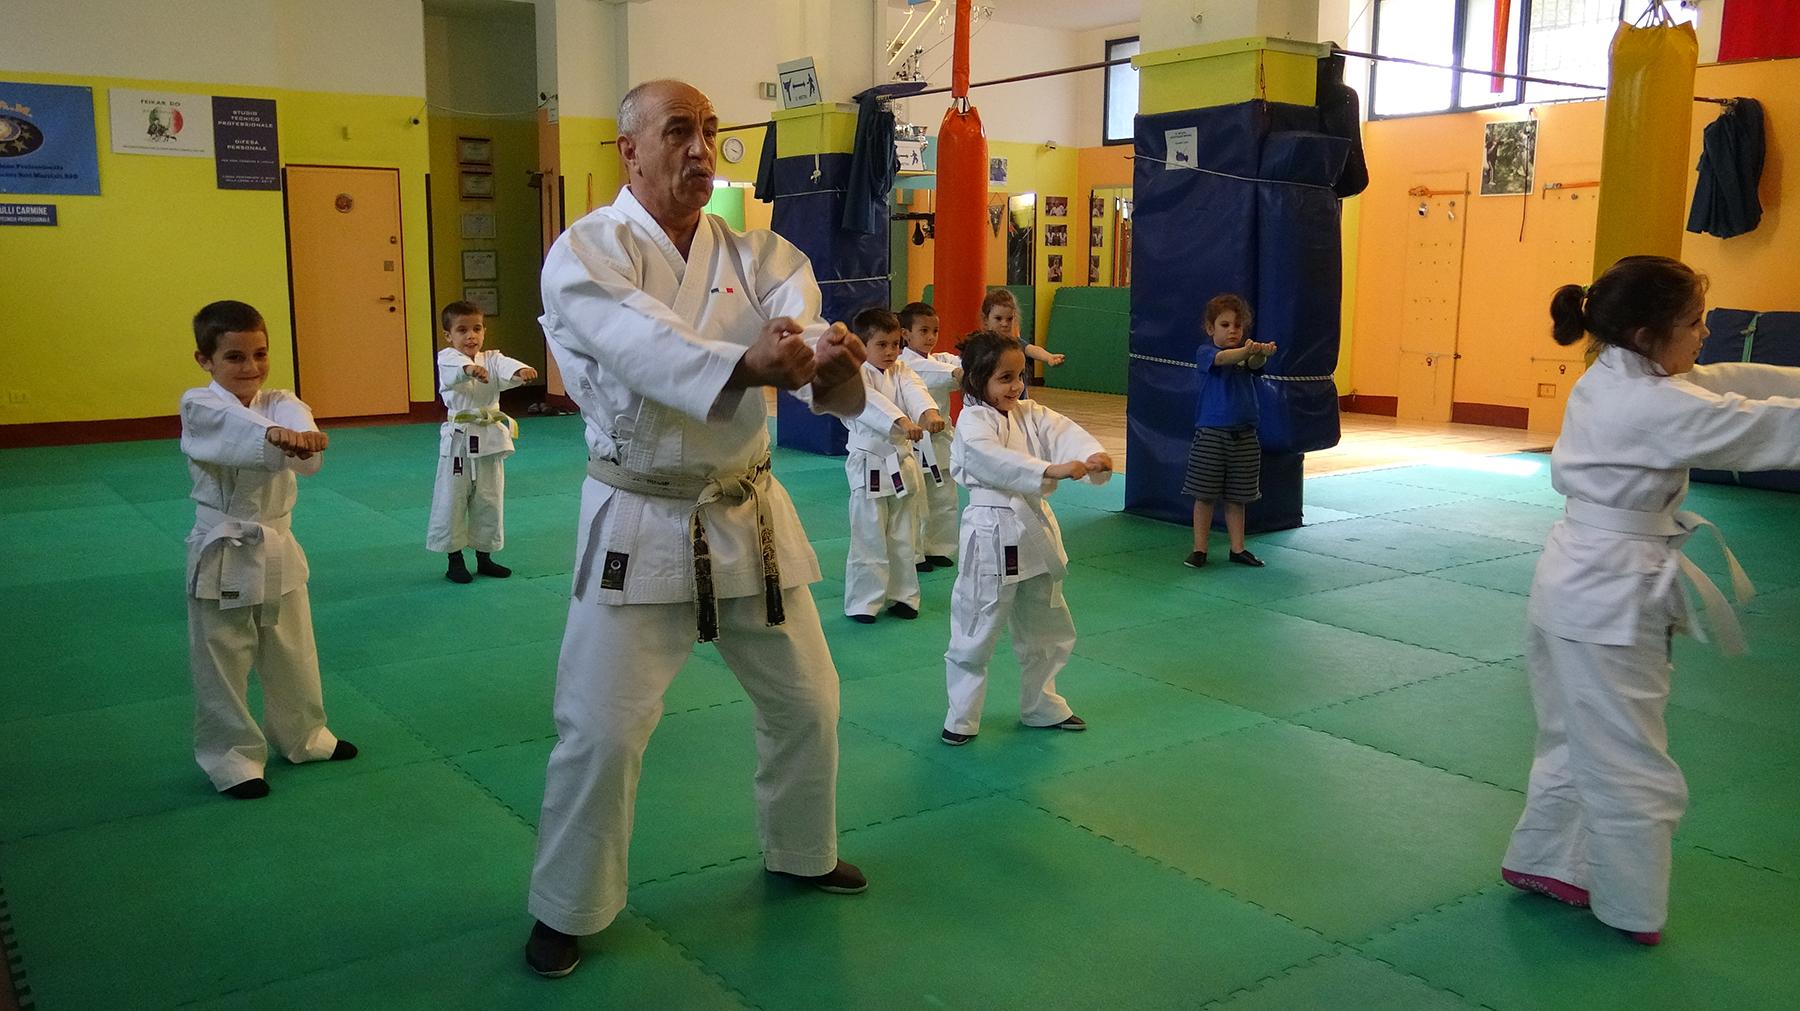 karate per bambini milano